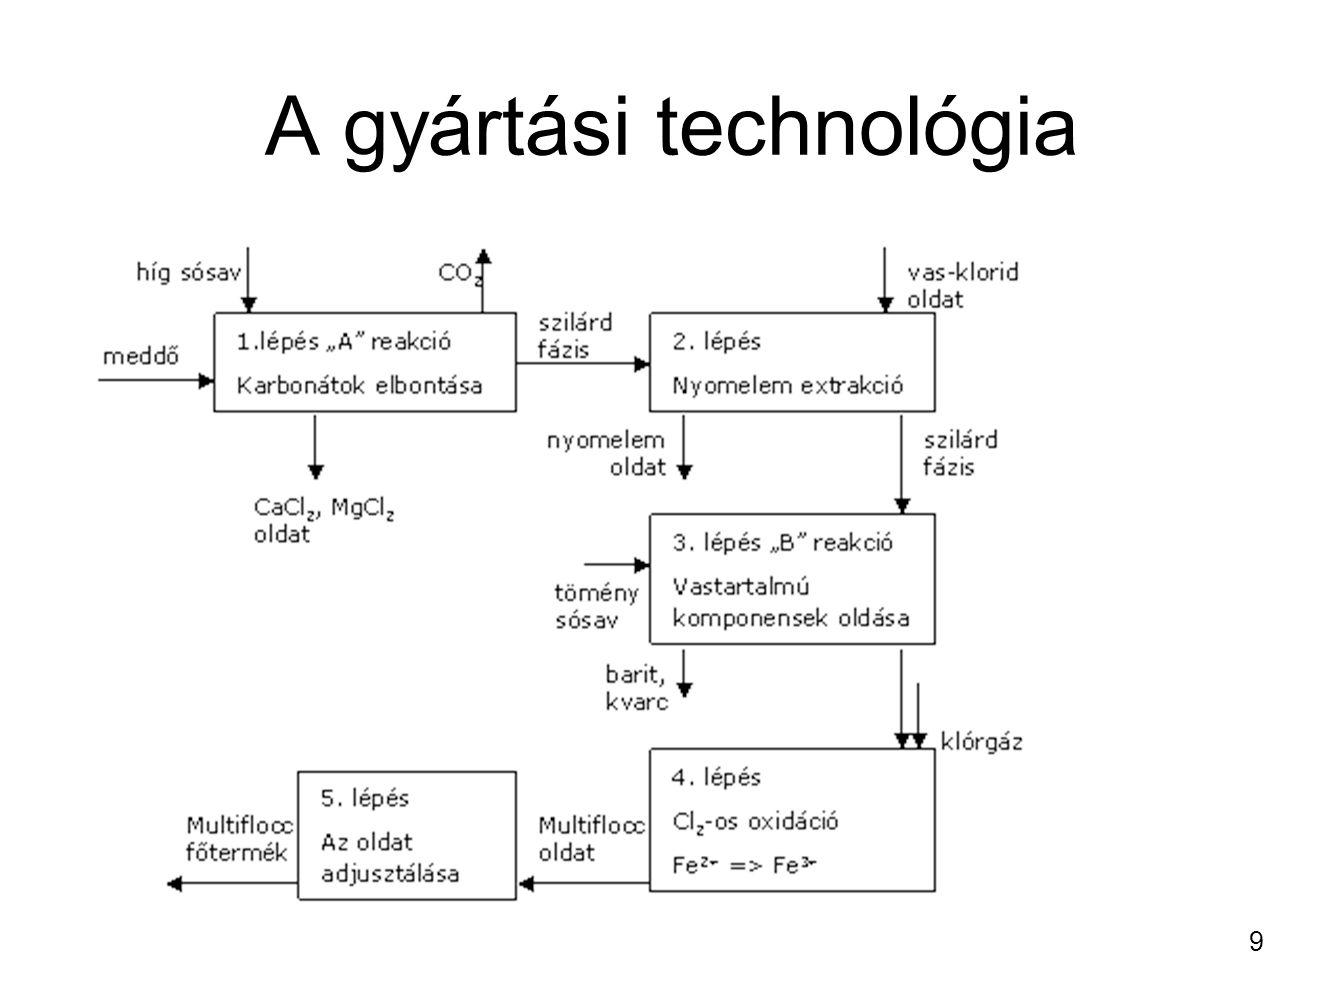 A gyártási technológia